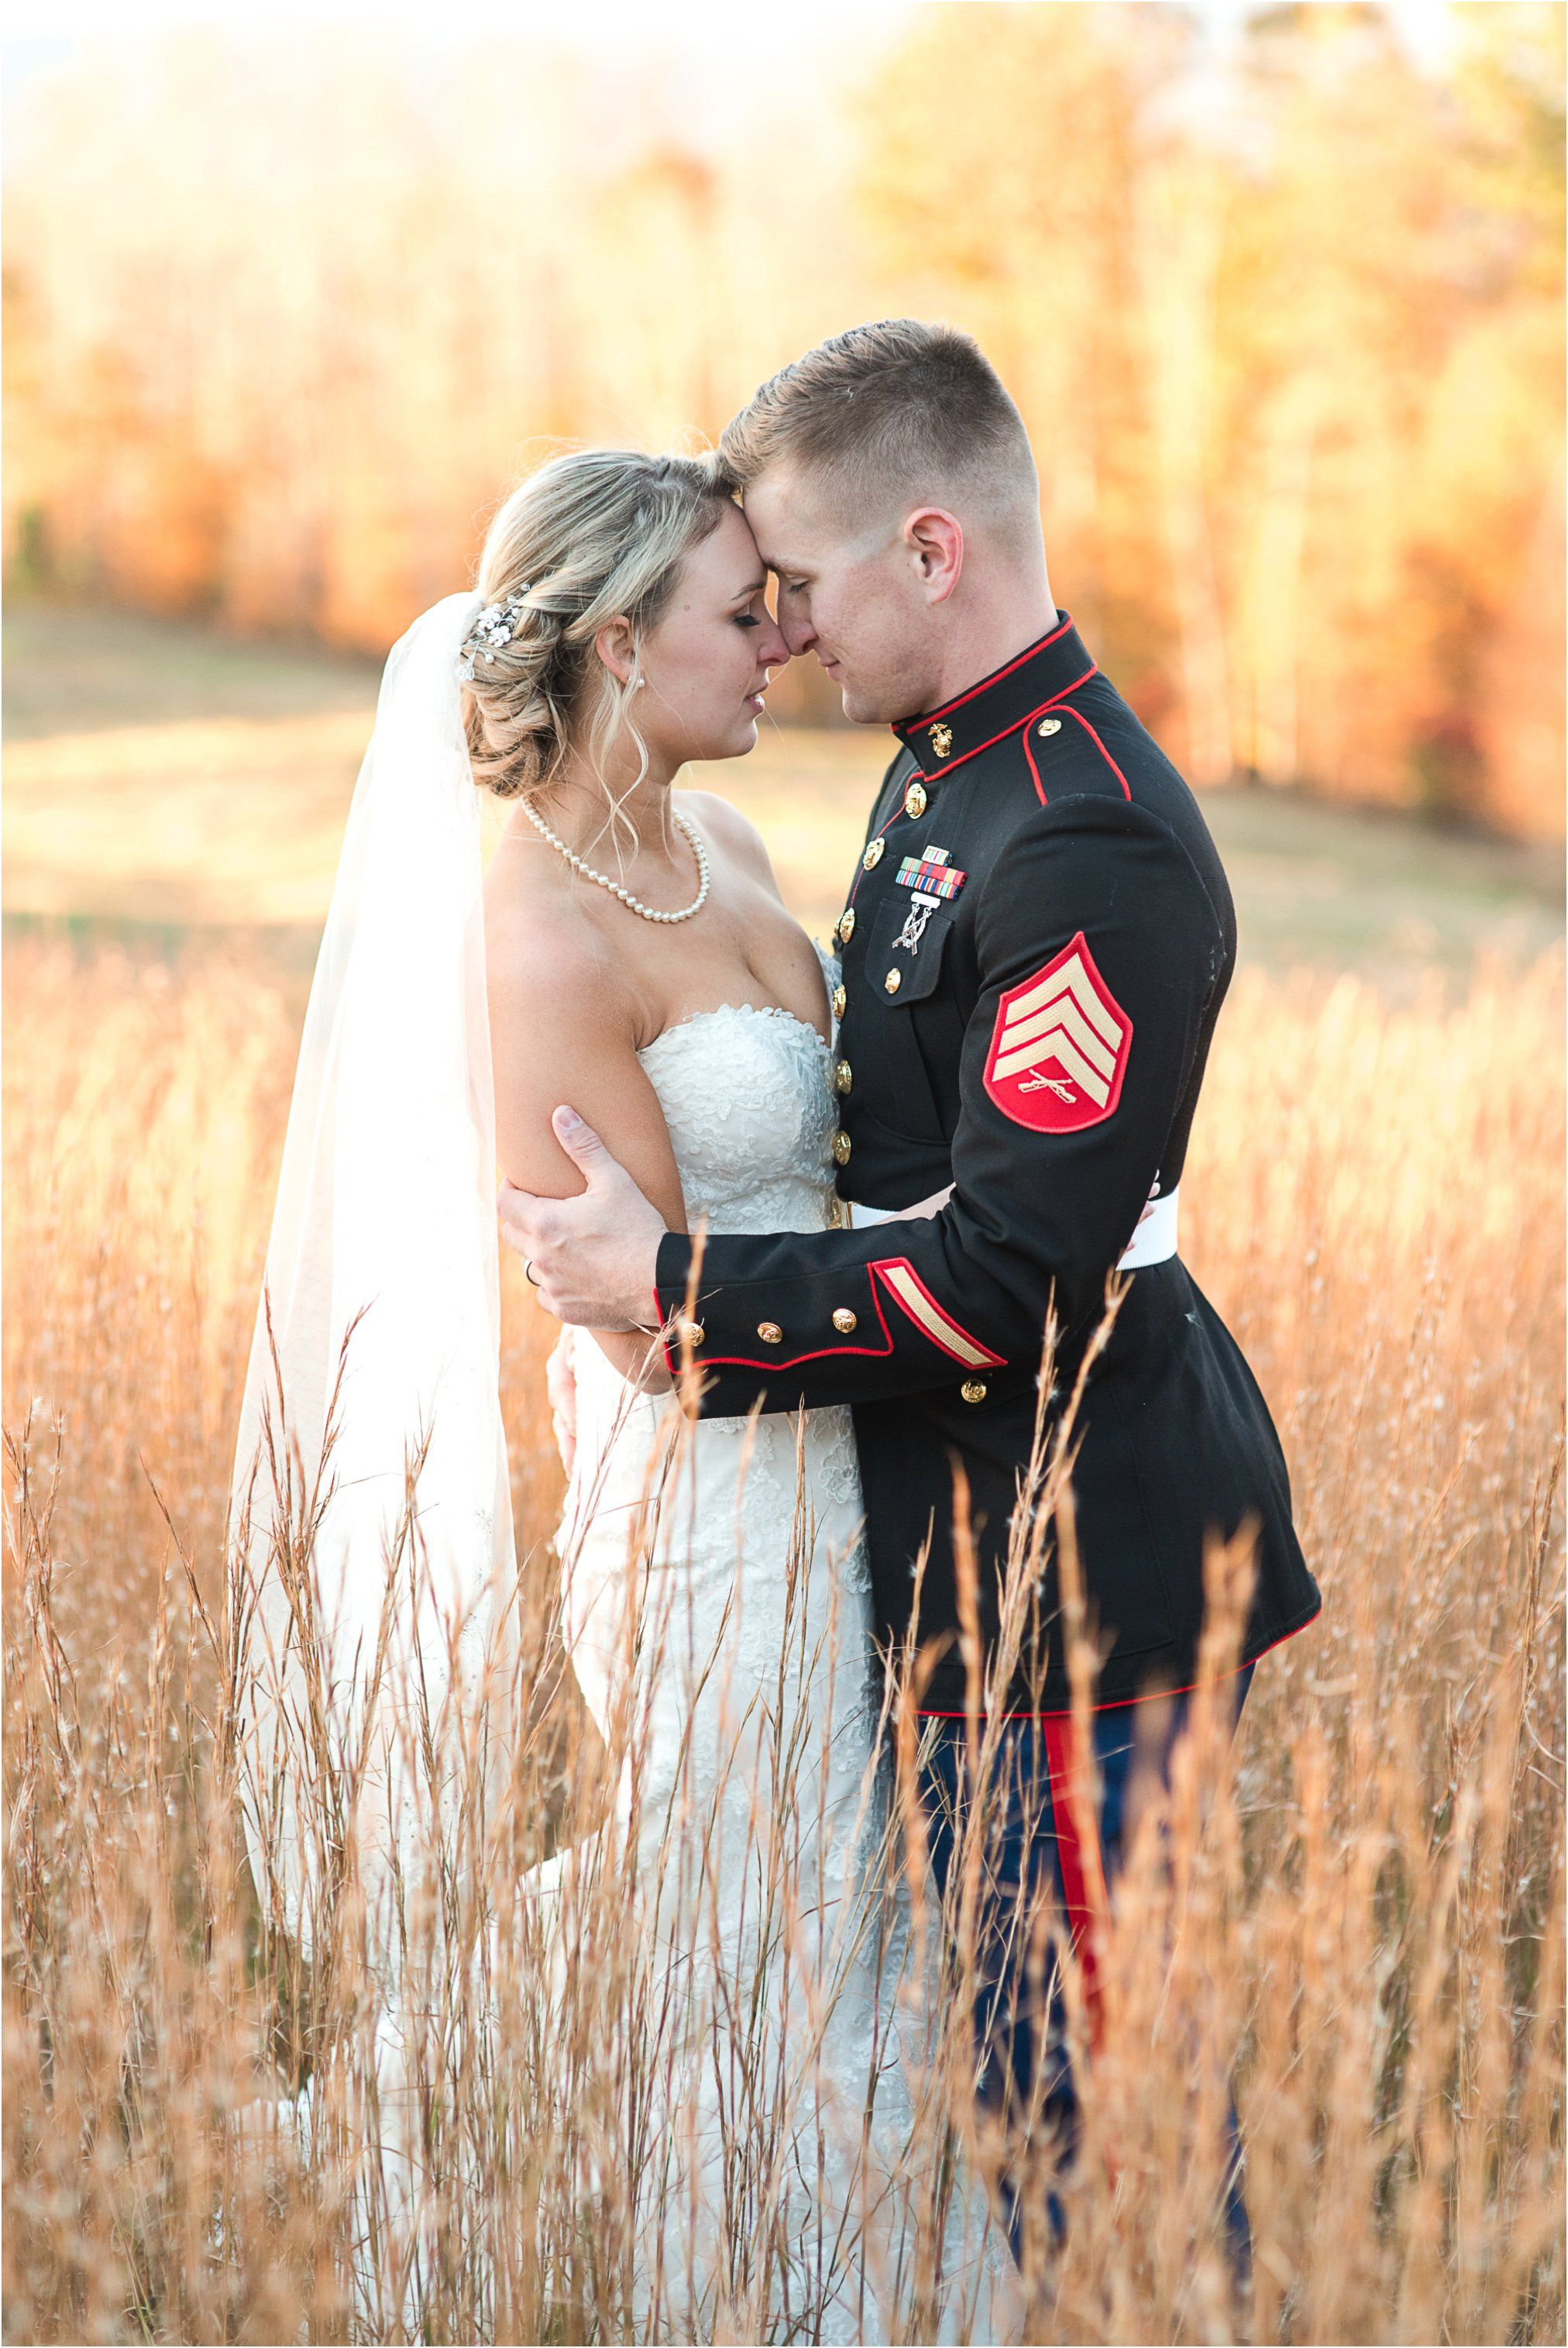 Marine Corps Wedding Dress Blues Marine Corps Wedding Blue Wedding Dresses Dress Blues Marines [ 3030 x 2024 Pixel ]